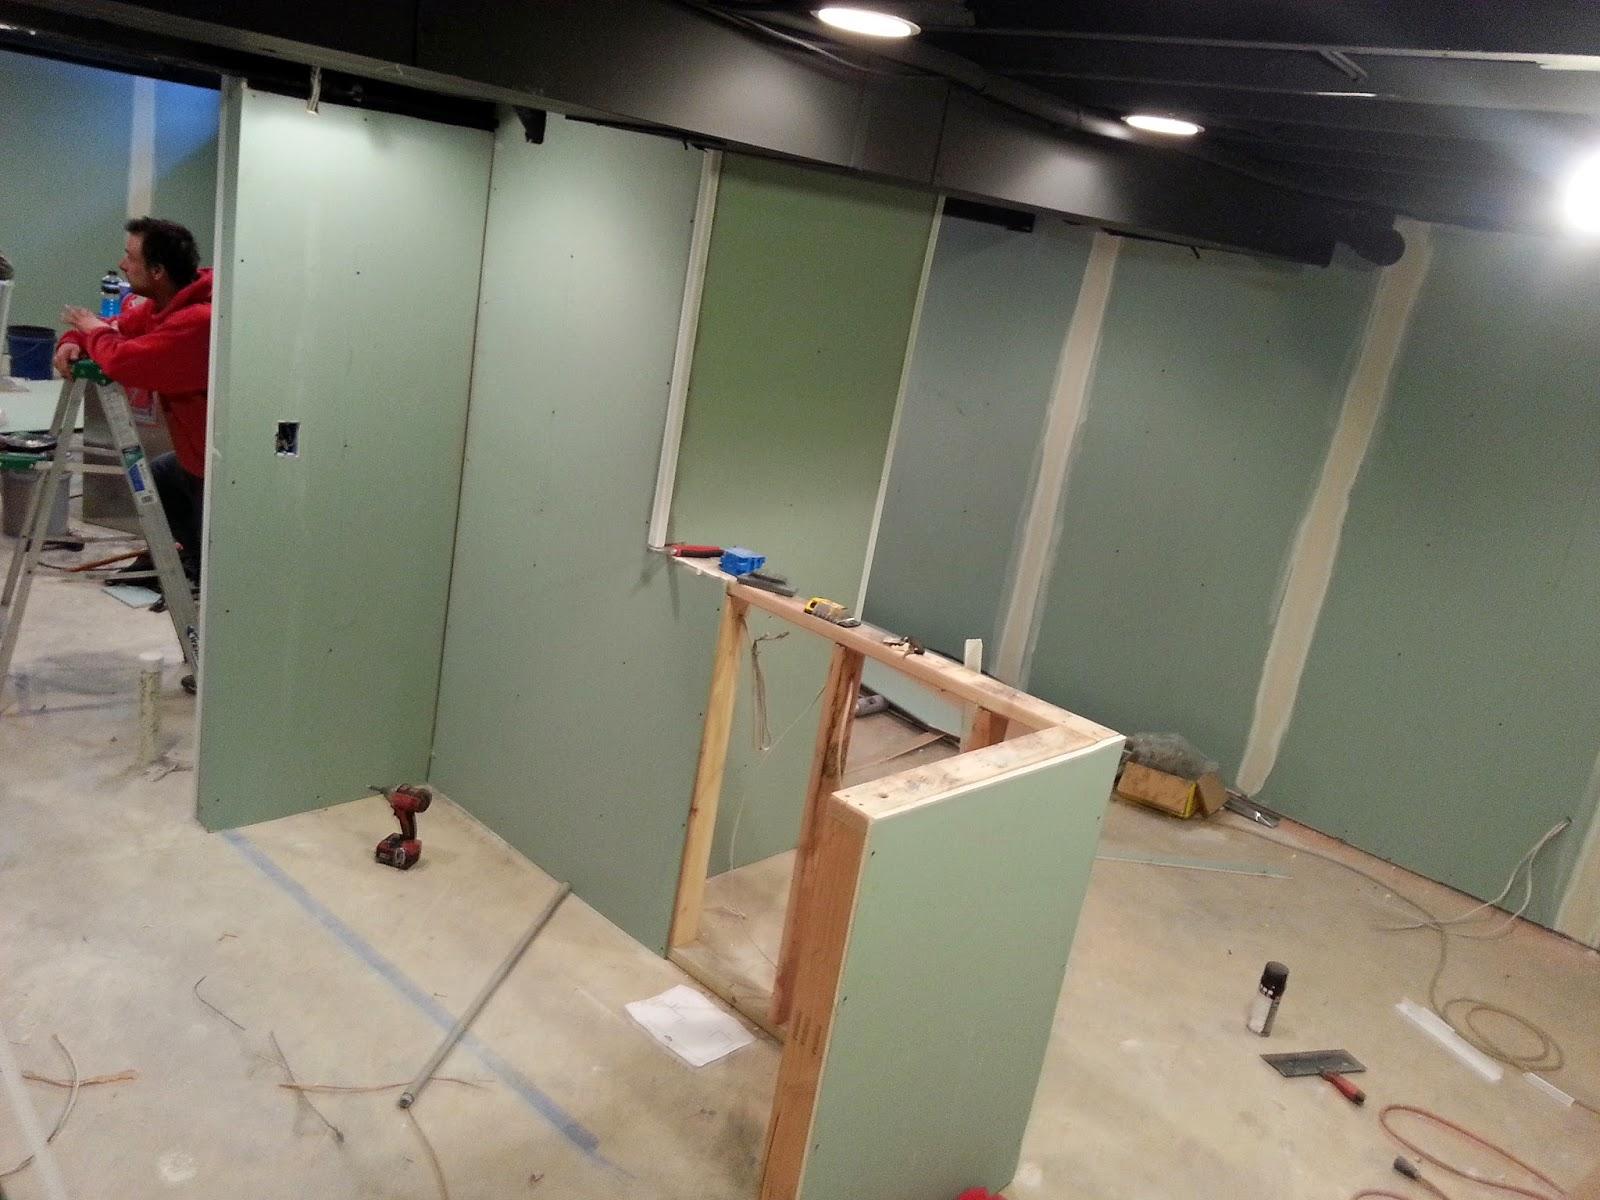 basement finishing drywall on metal and wood studs